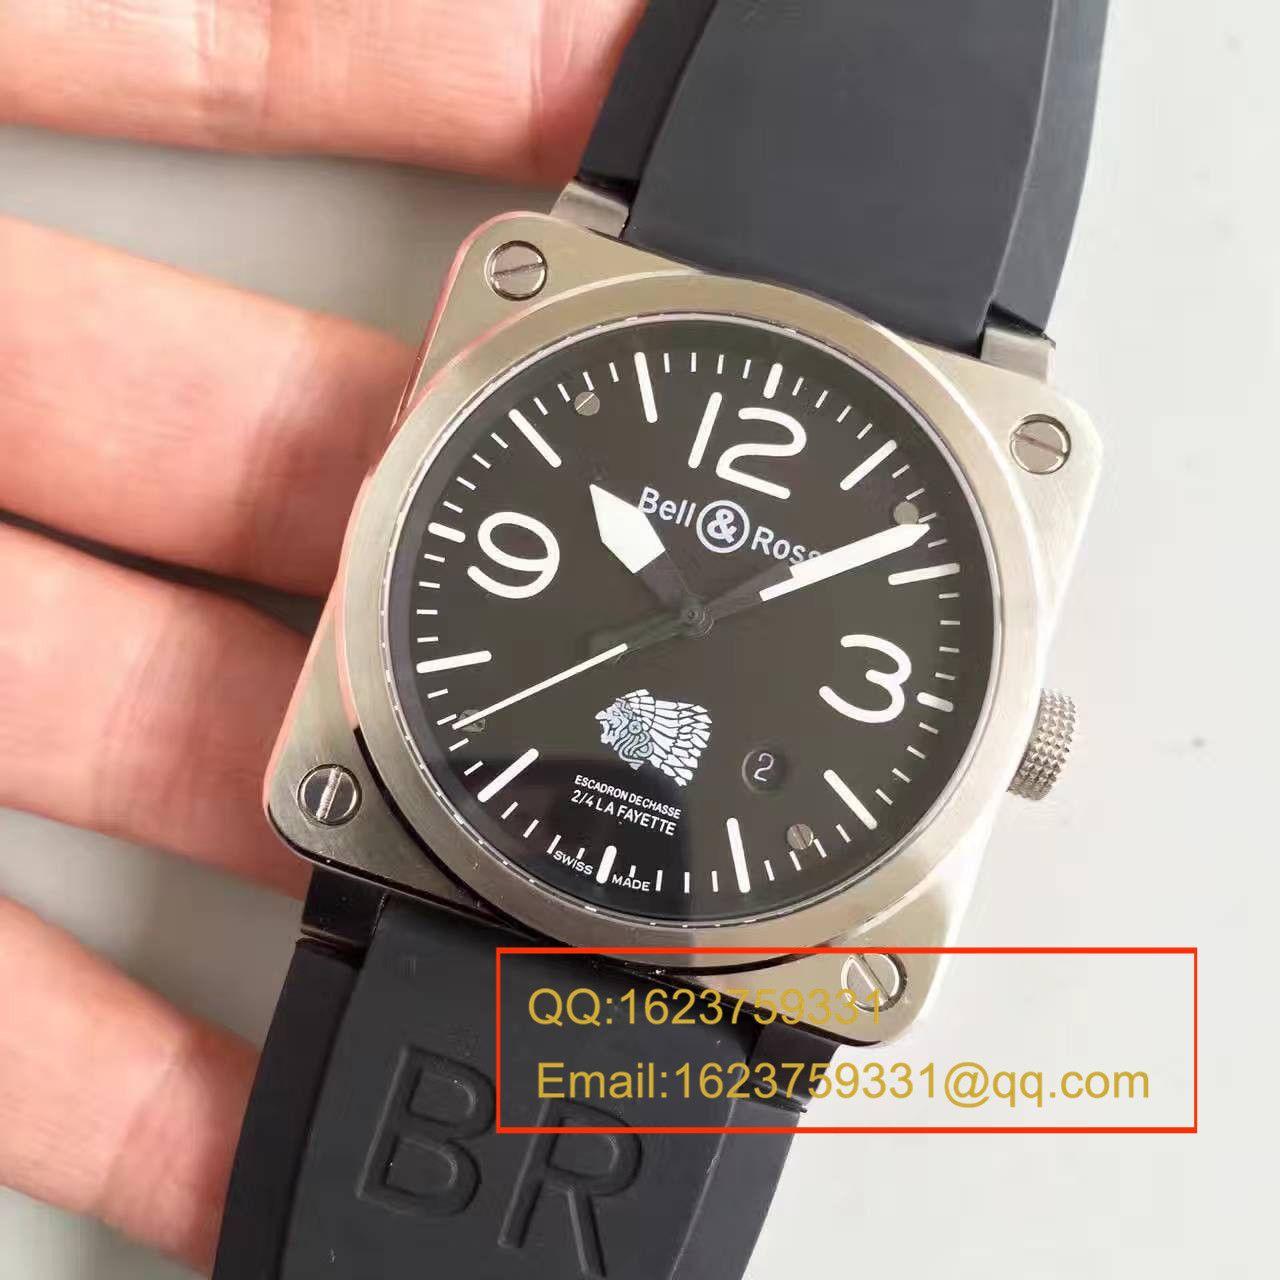 【BR一比一精仿手表】柏莱仕美军指定军表品牌印地安人头像 专属特别版腕表 BR03-92 / BLS013